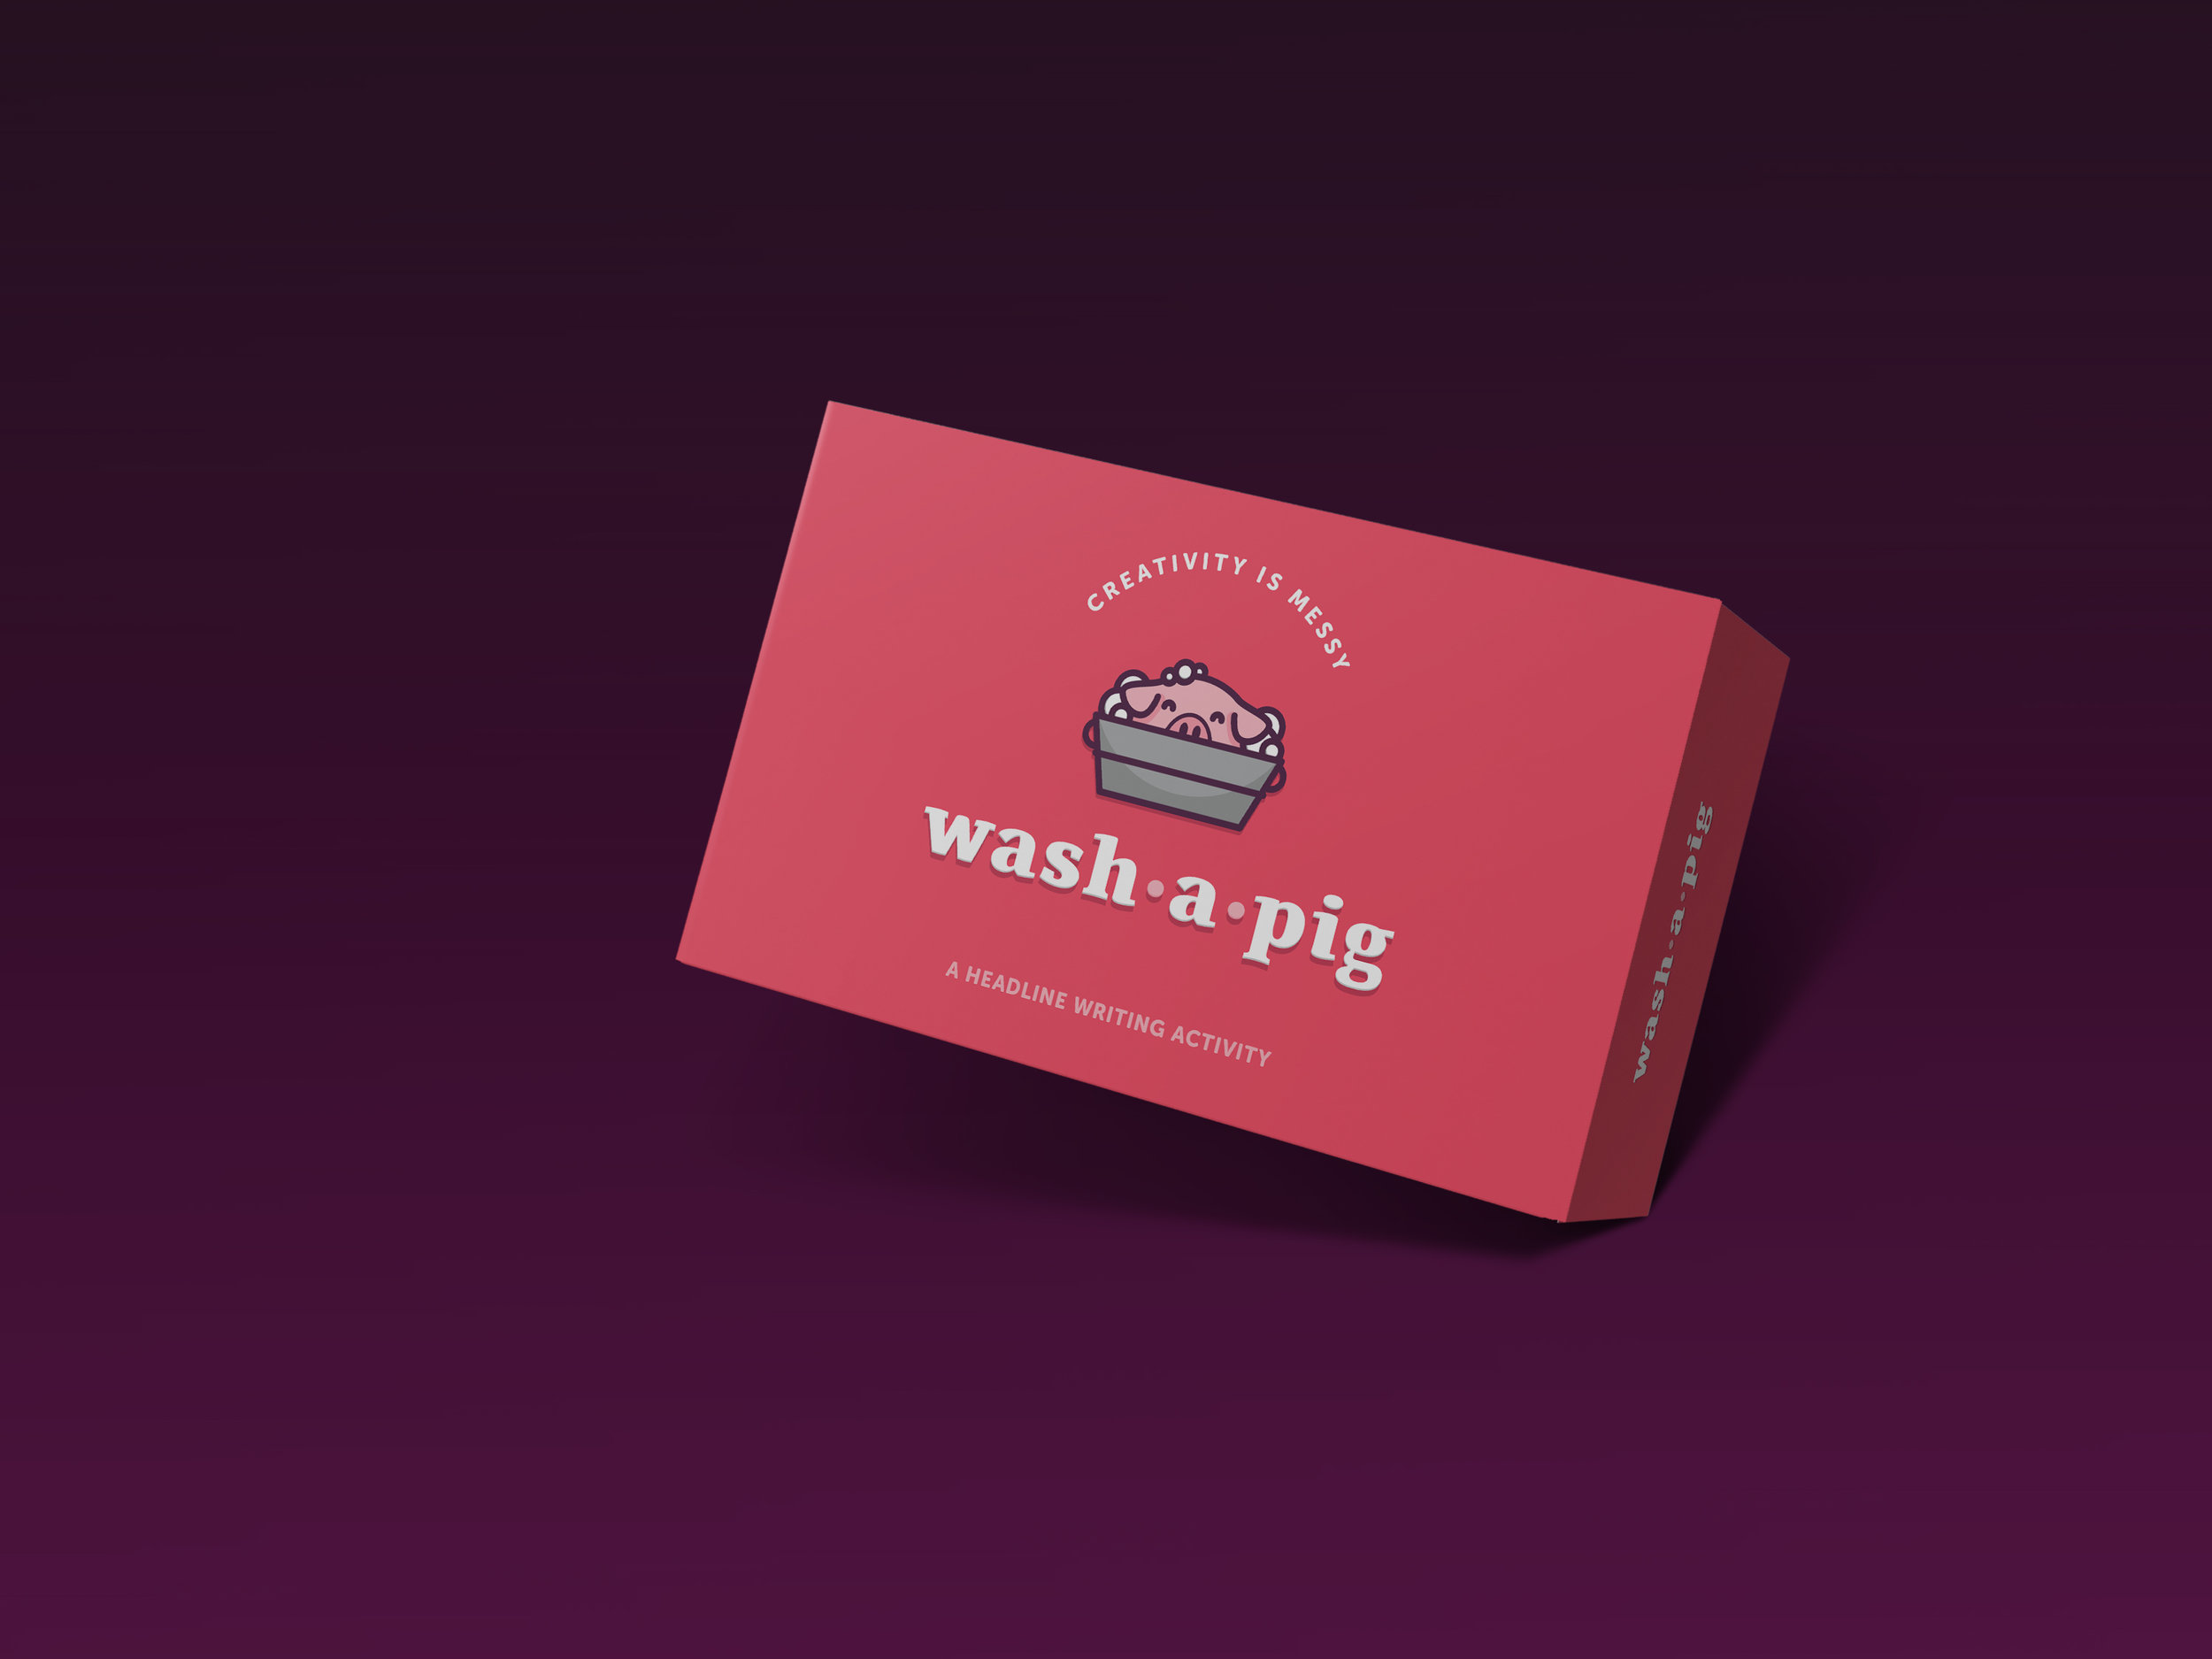 wash_a_pig-product_shot-CORE_DECK-w3b.jpg